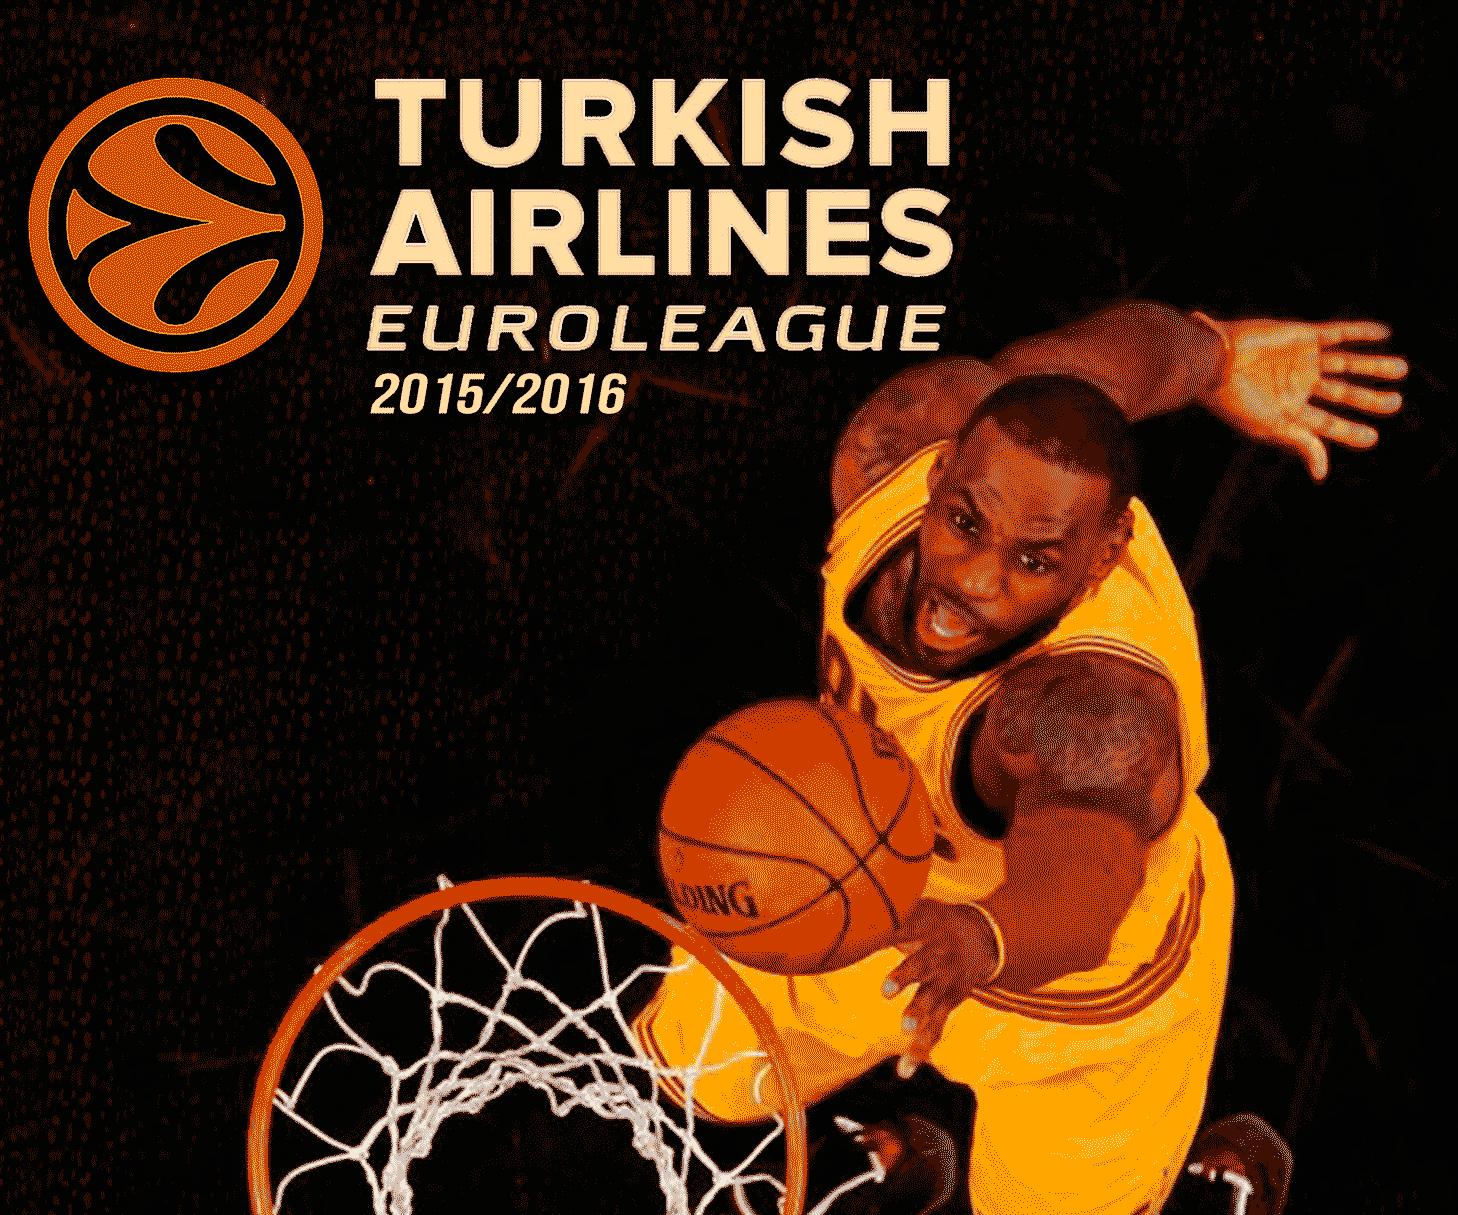 euroleague 2015/2016